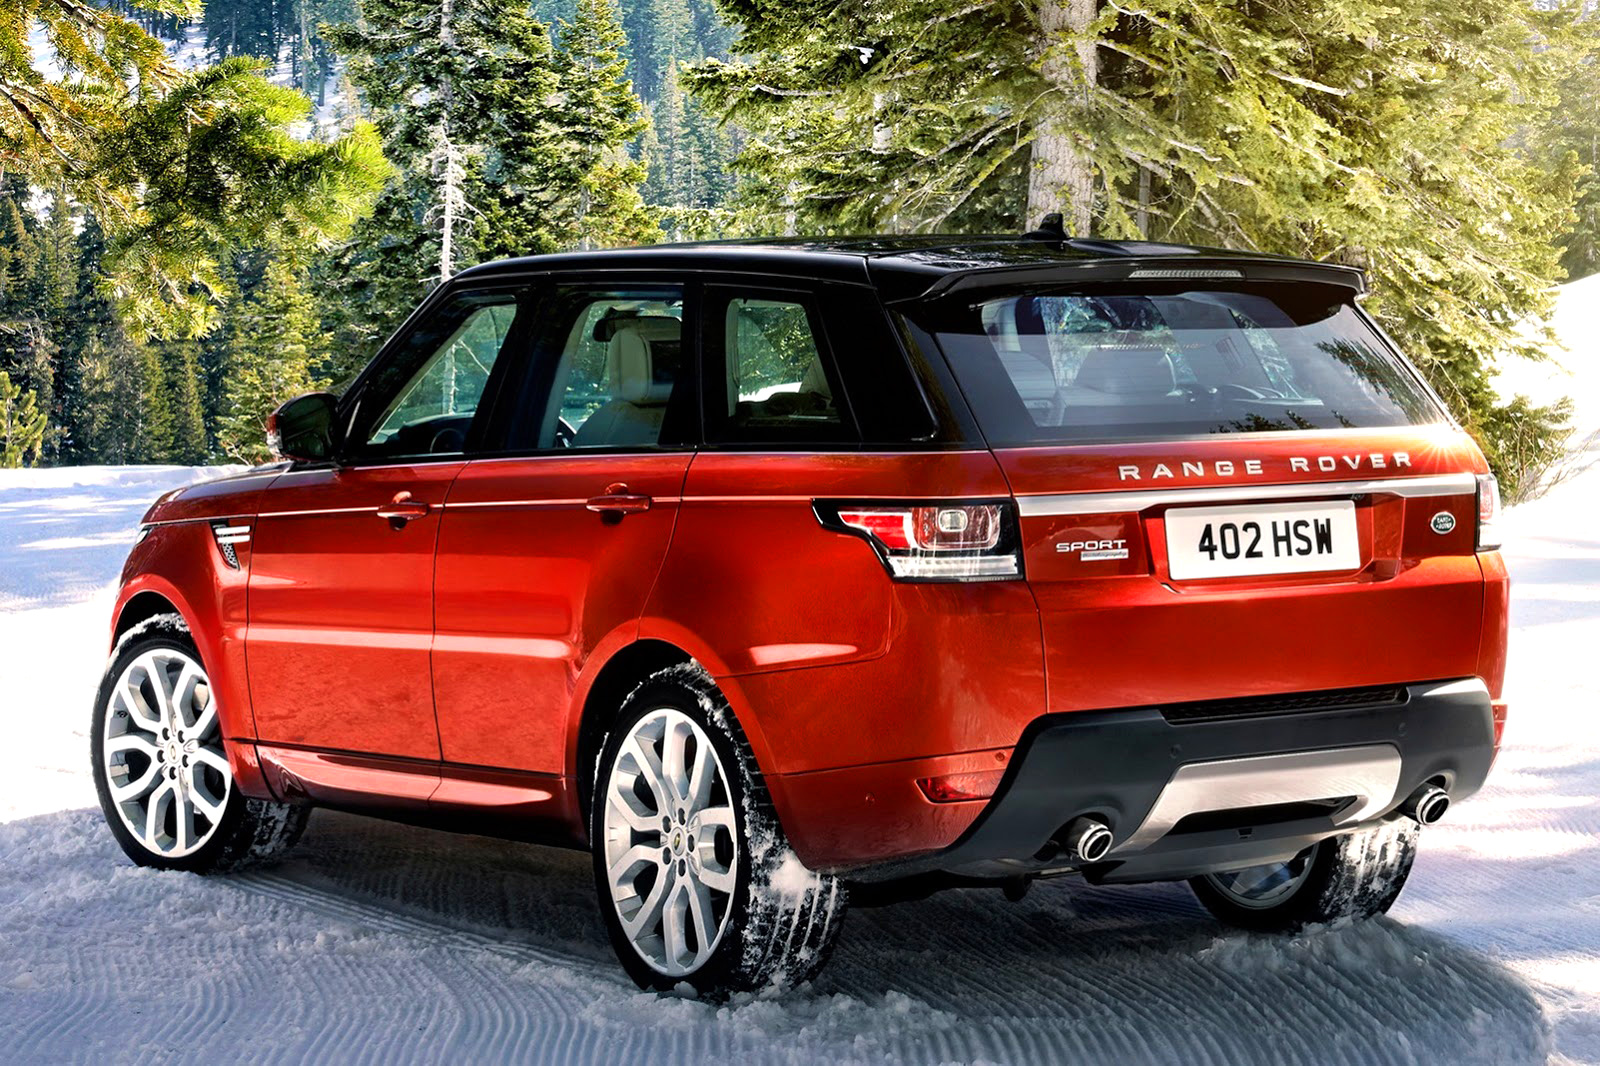 Jake's Car World: 2014 Range Rover Sport Debut In New York